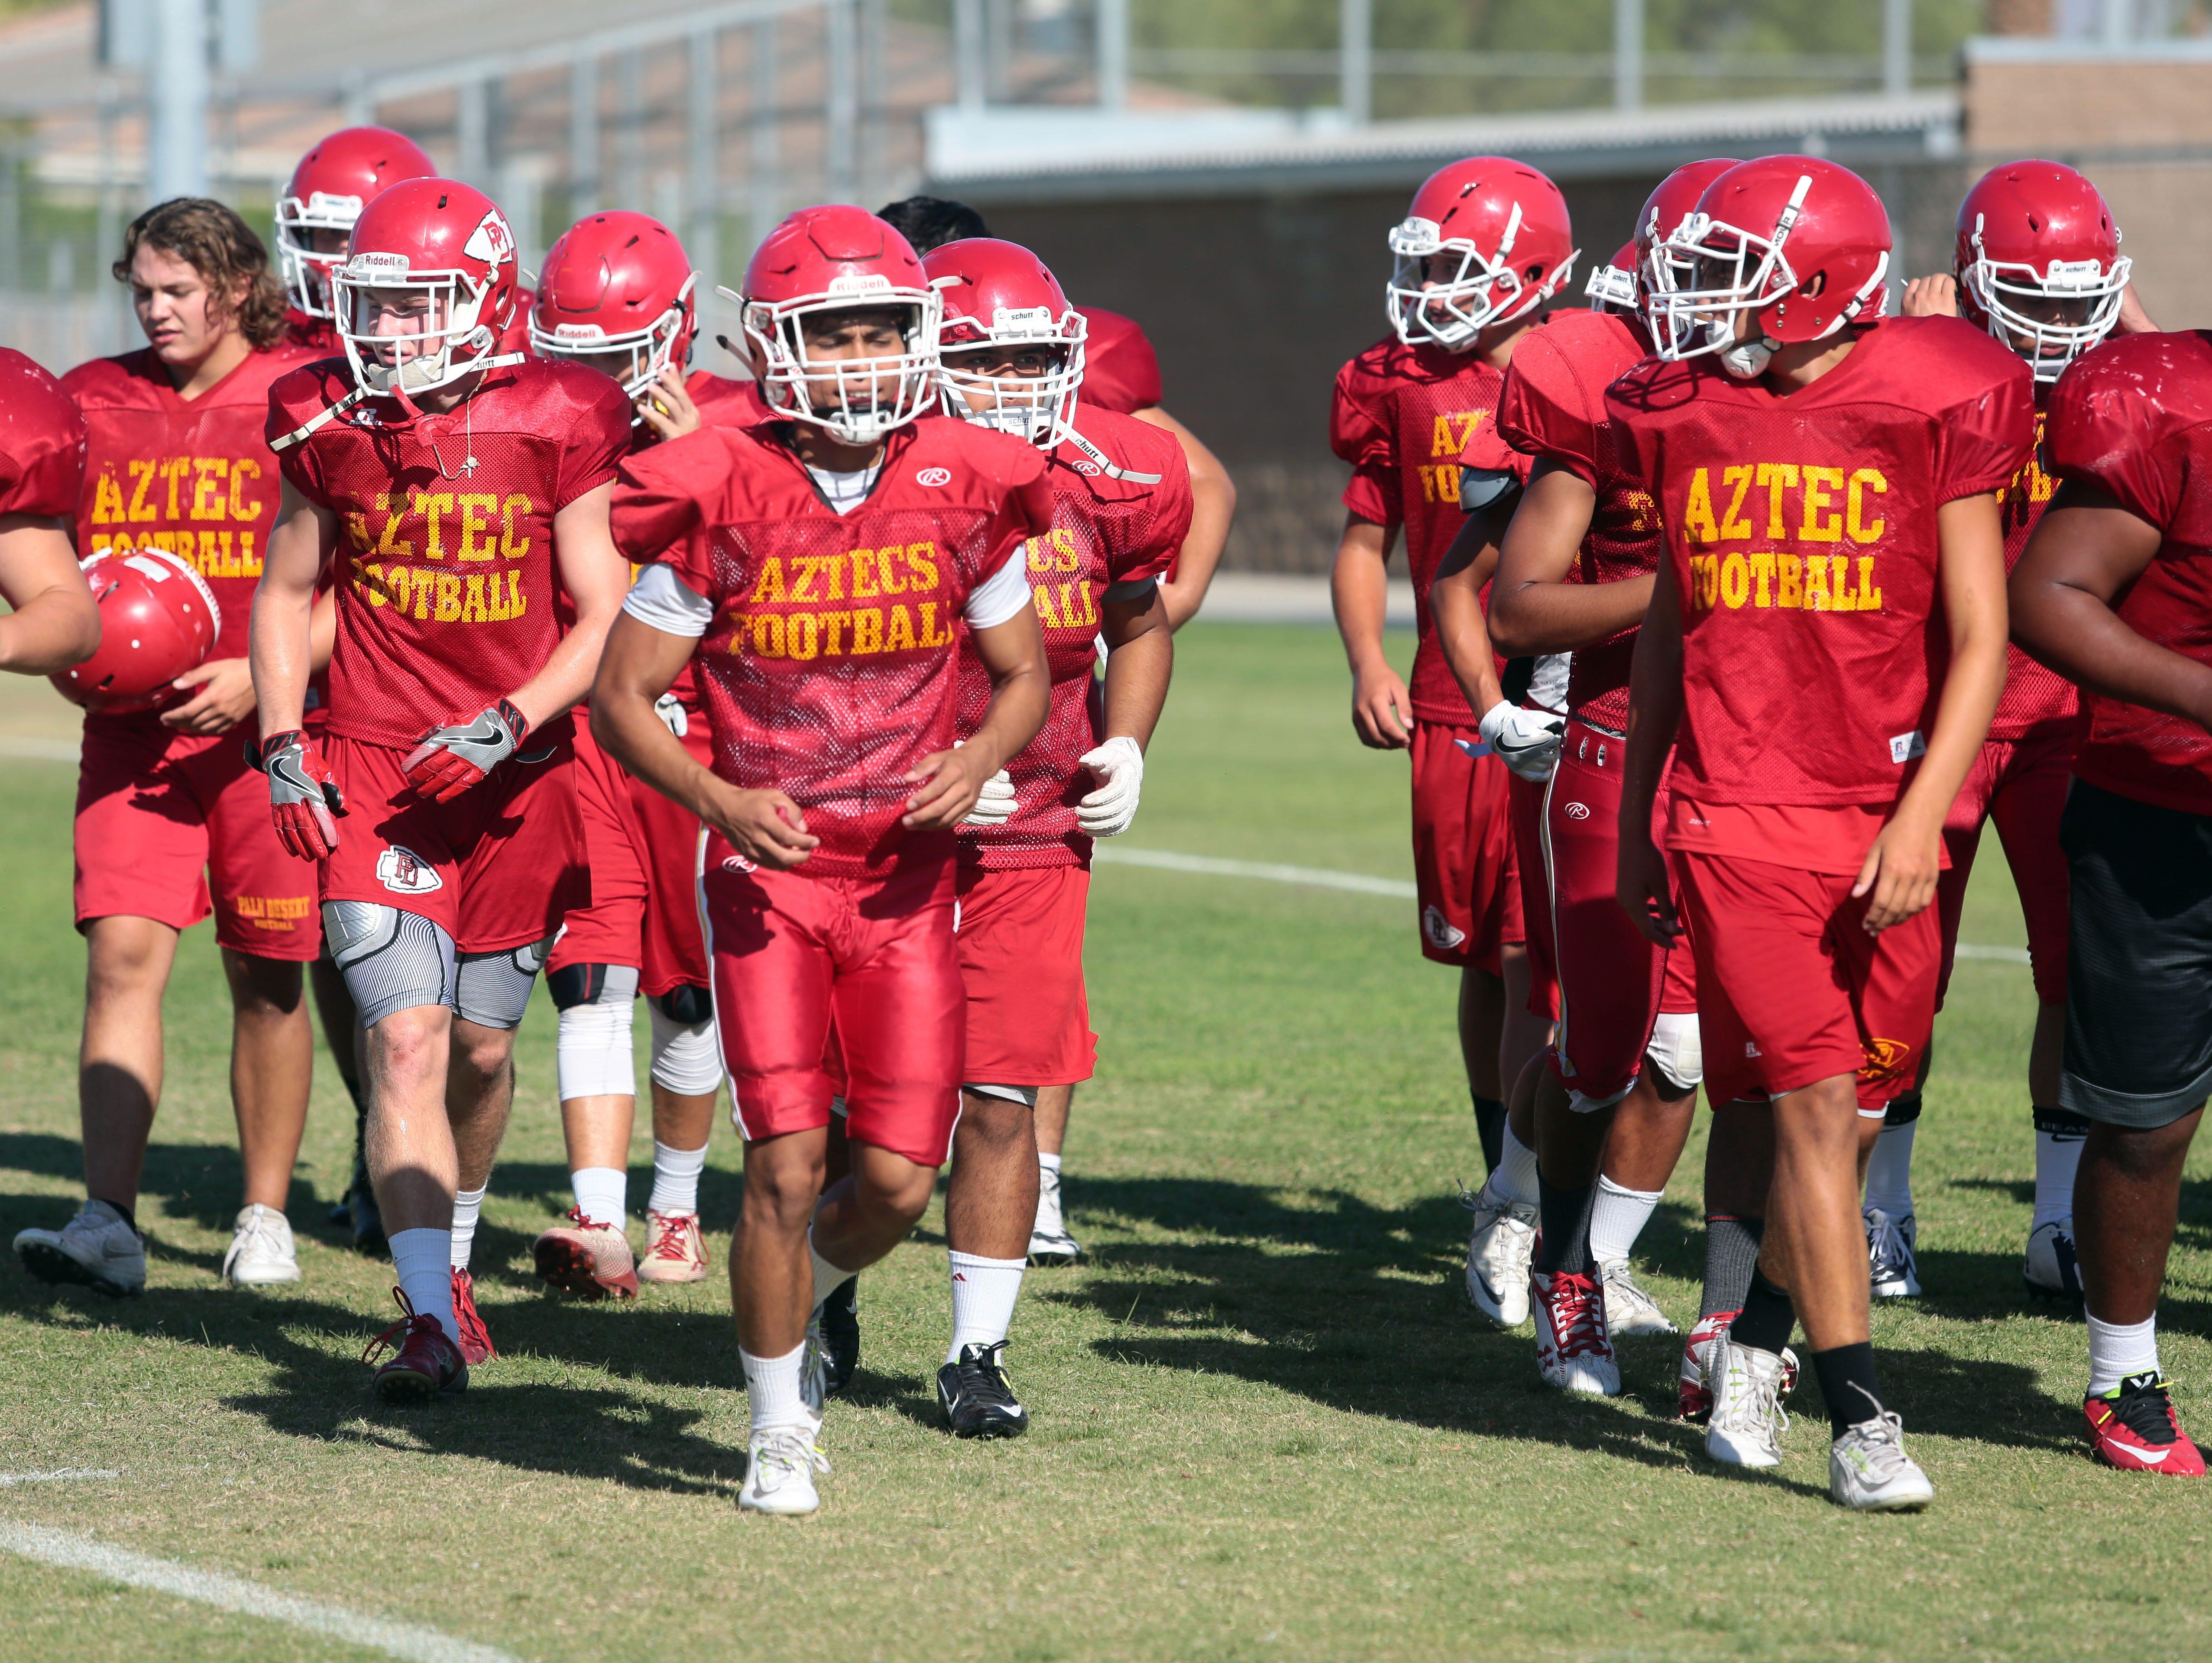 The Palm Desert High School football team practice on Tuesday, August 9, 2016 in Palm Desert.